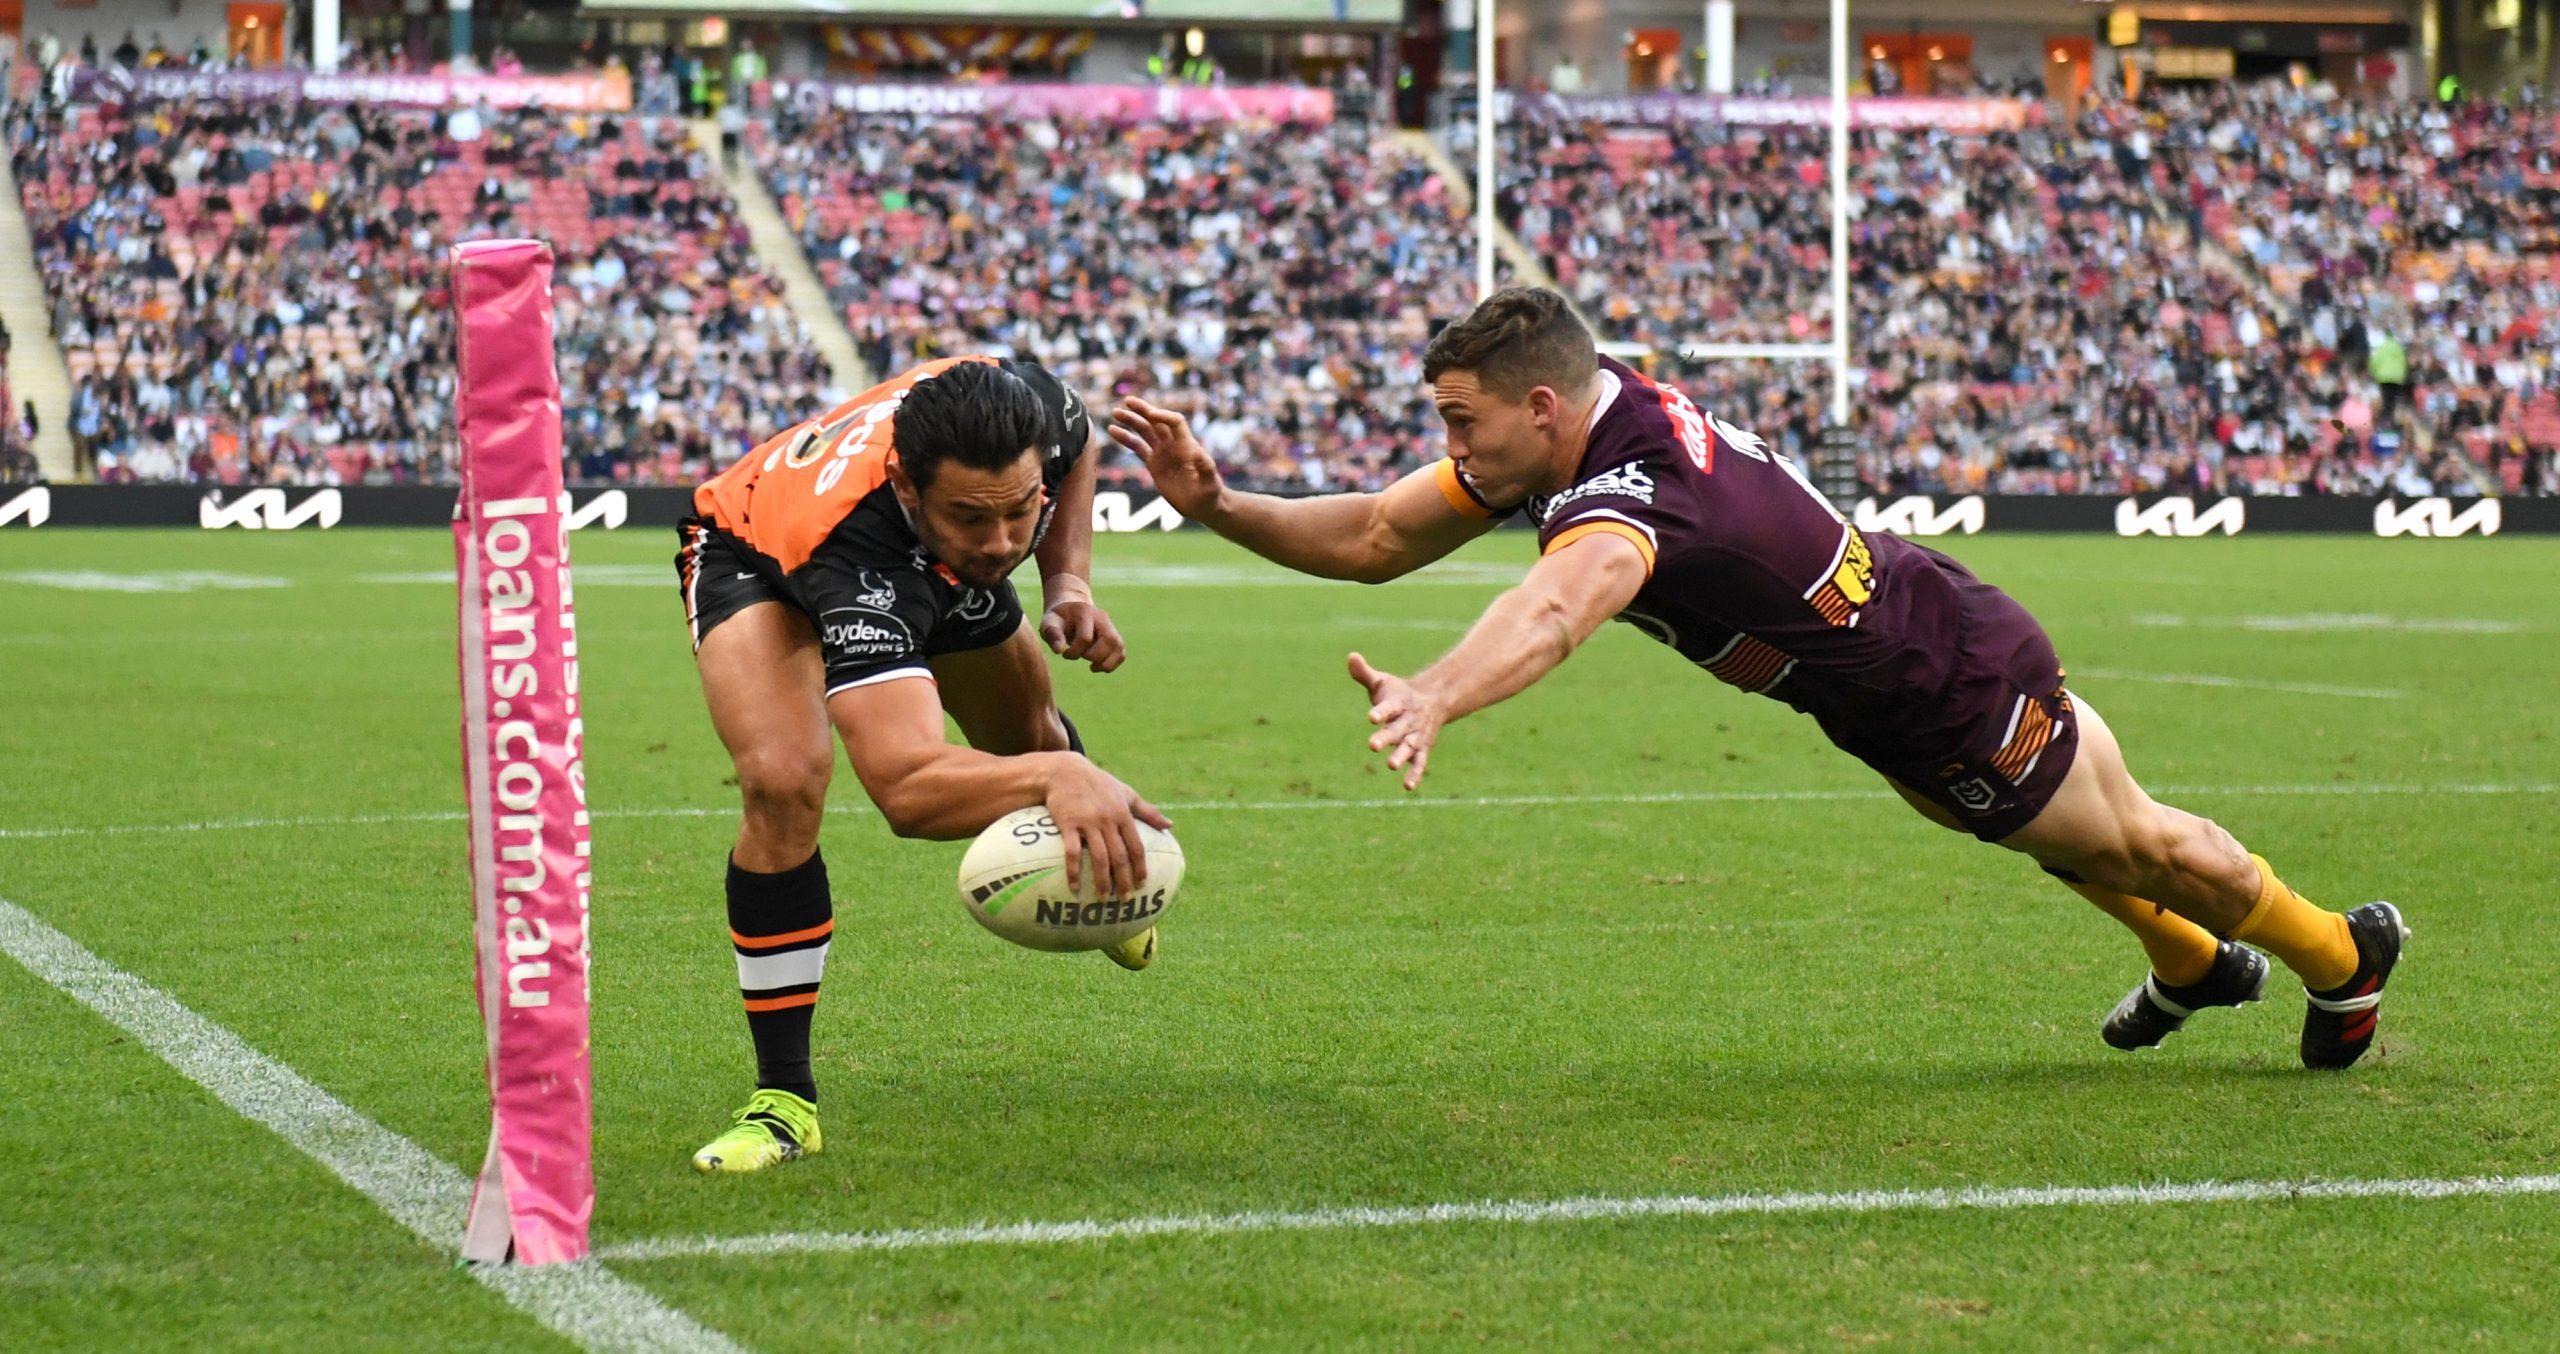 Doueihi dazzles as Tigers claw past lacklustre Broncos